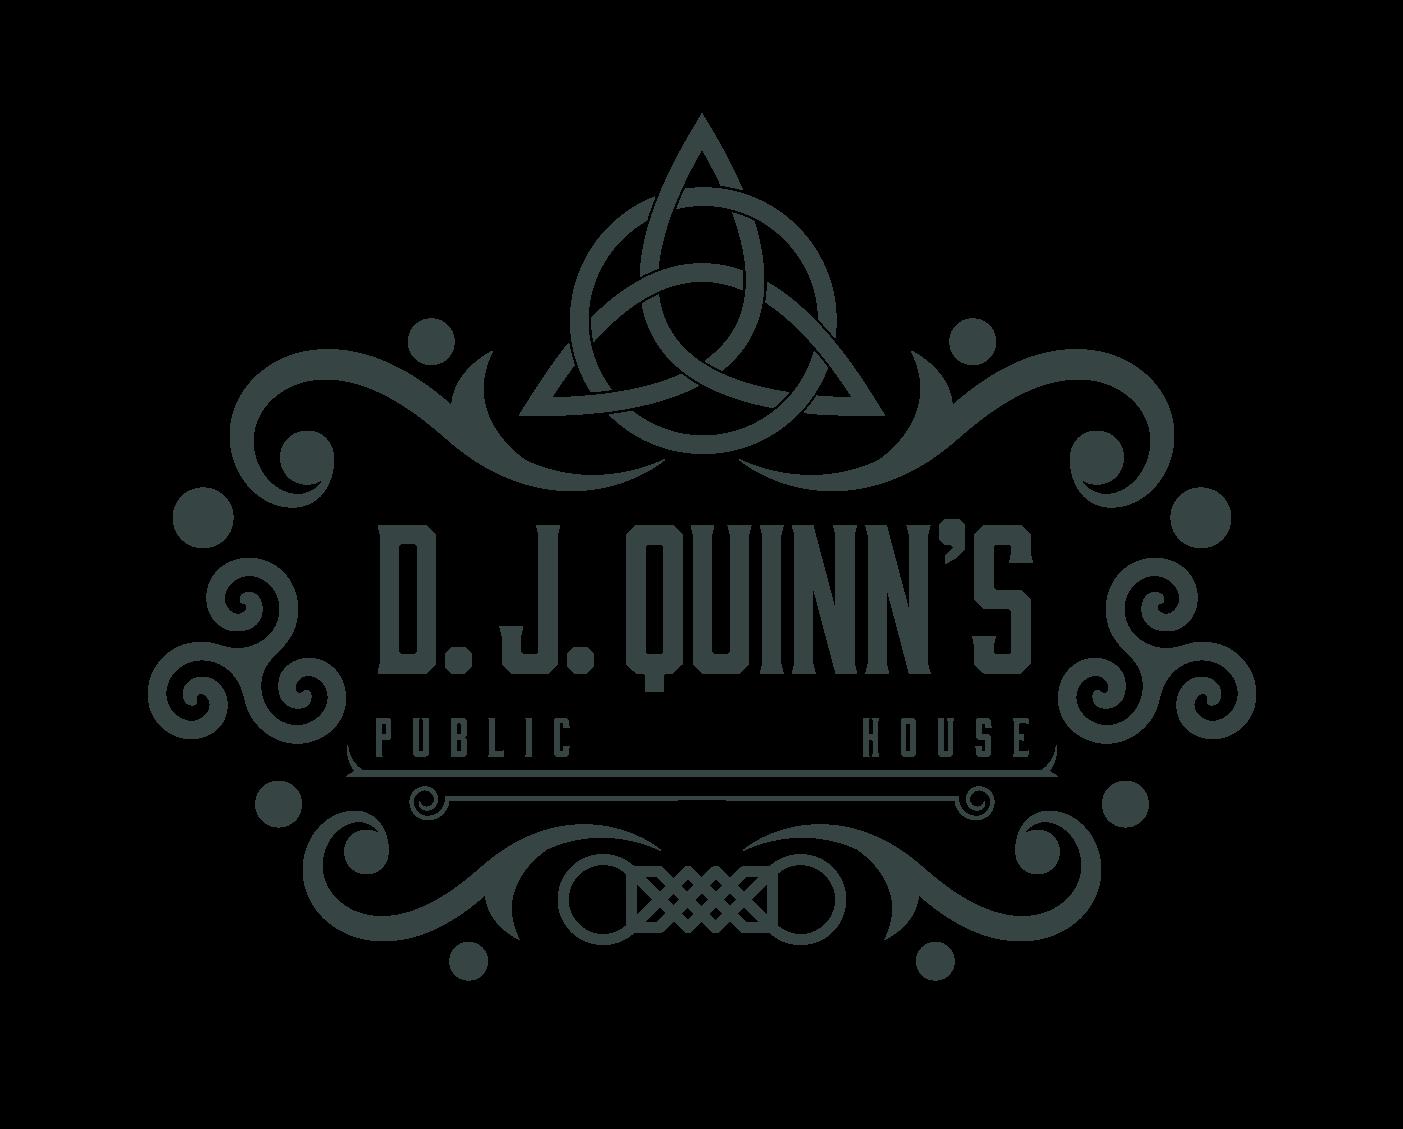 D. J. Quinn's